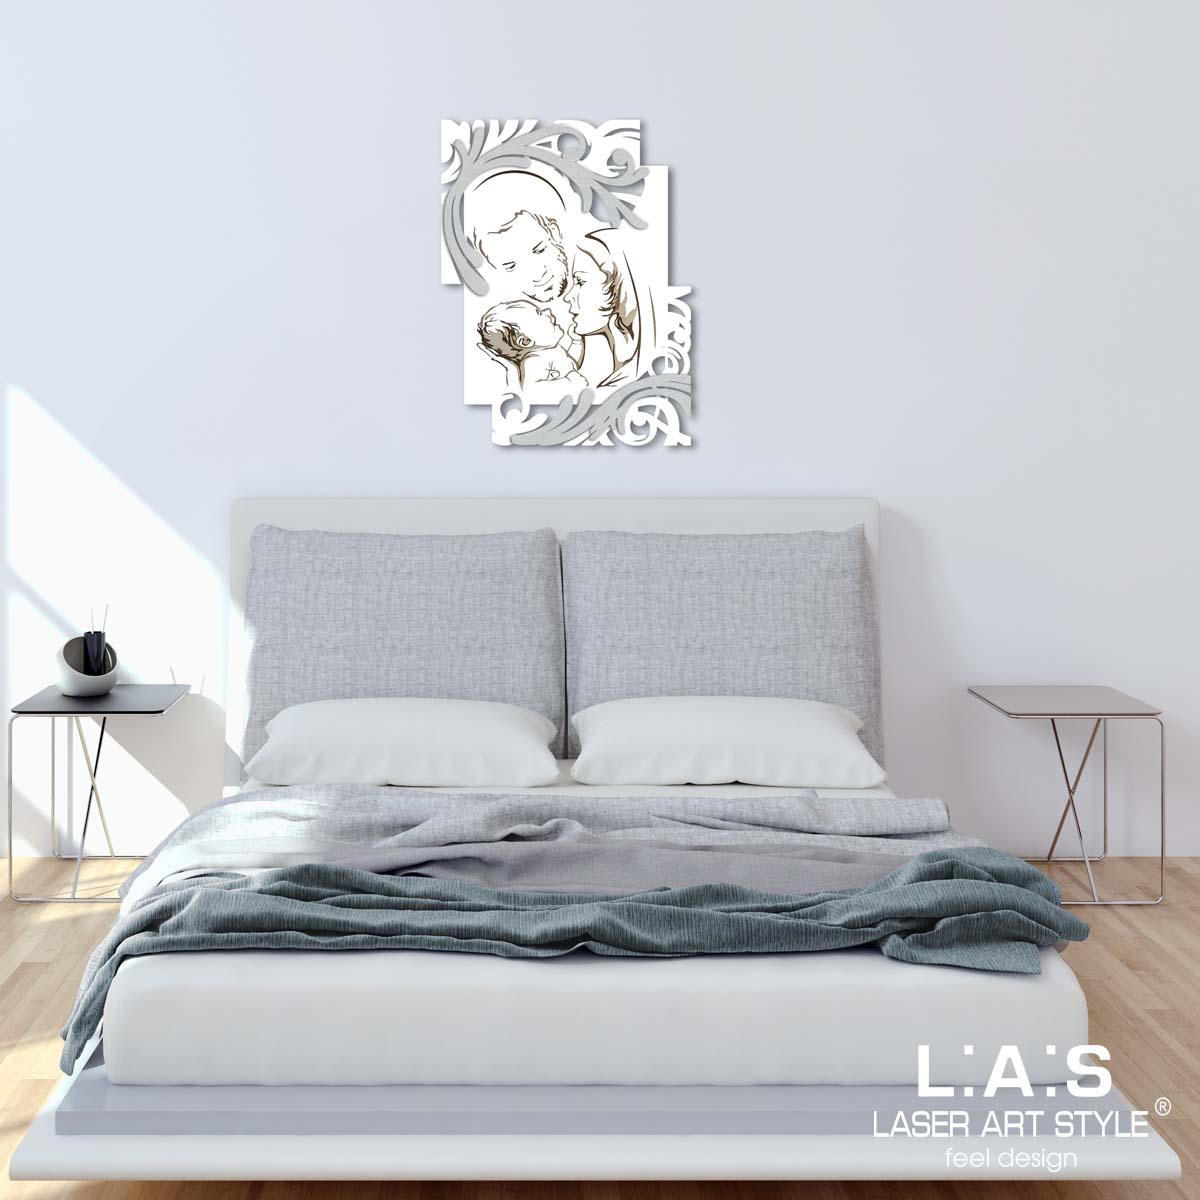 L:A:S - Laser Art Style - CAPEZZALE DESIGN MODERNO  – SI-237 BIANCO-ARGENTO